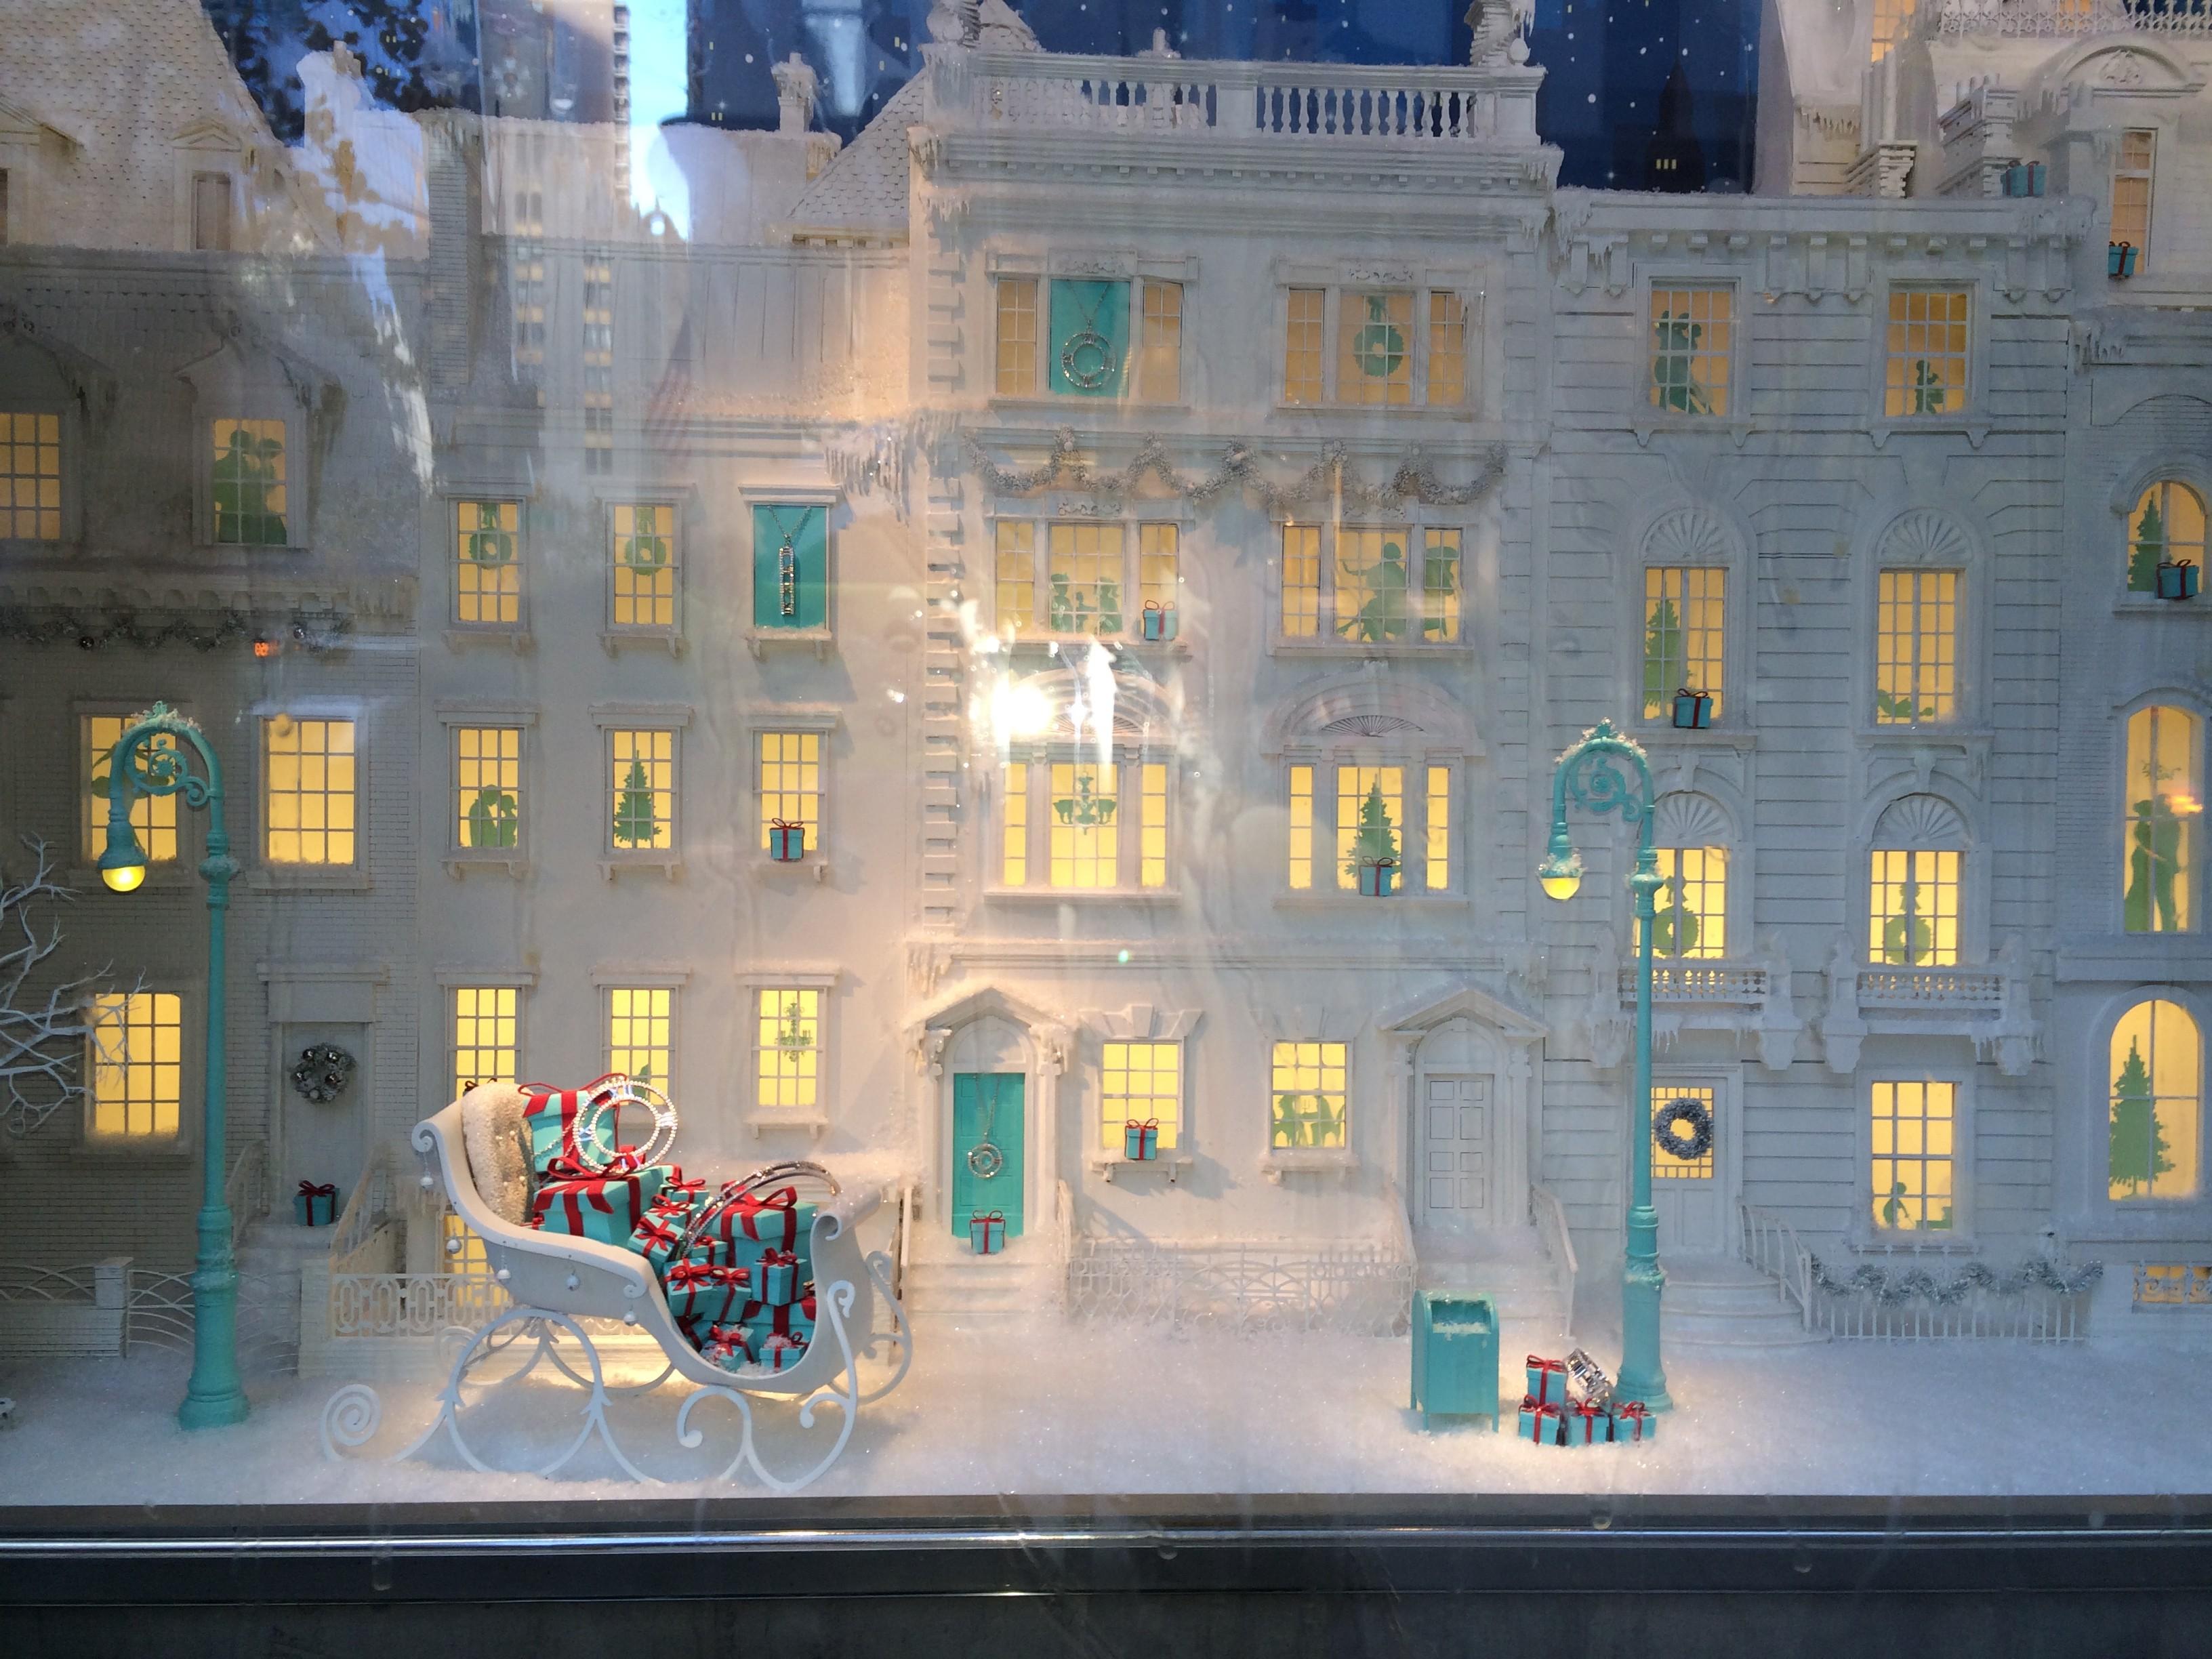 Tiffany's, 5th Avenue